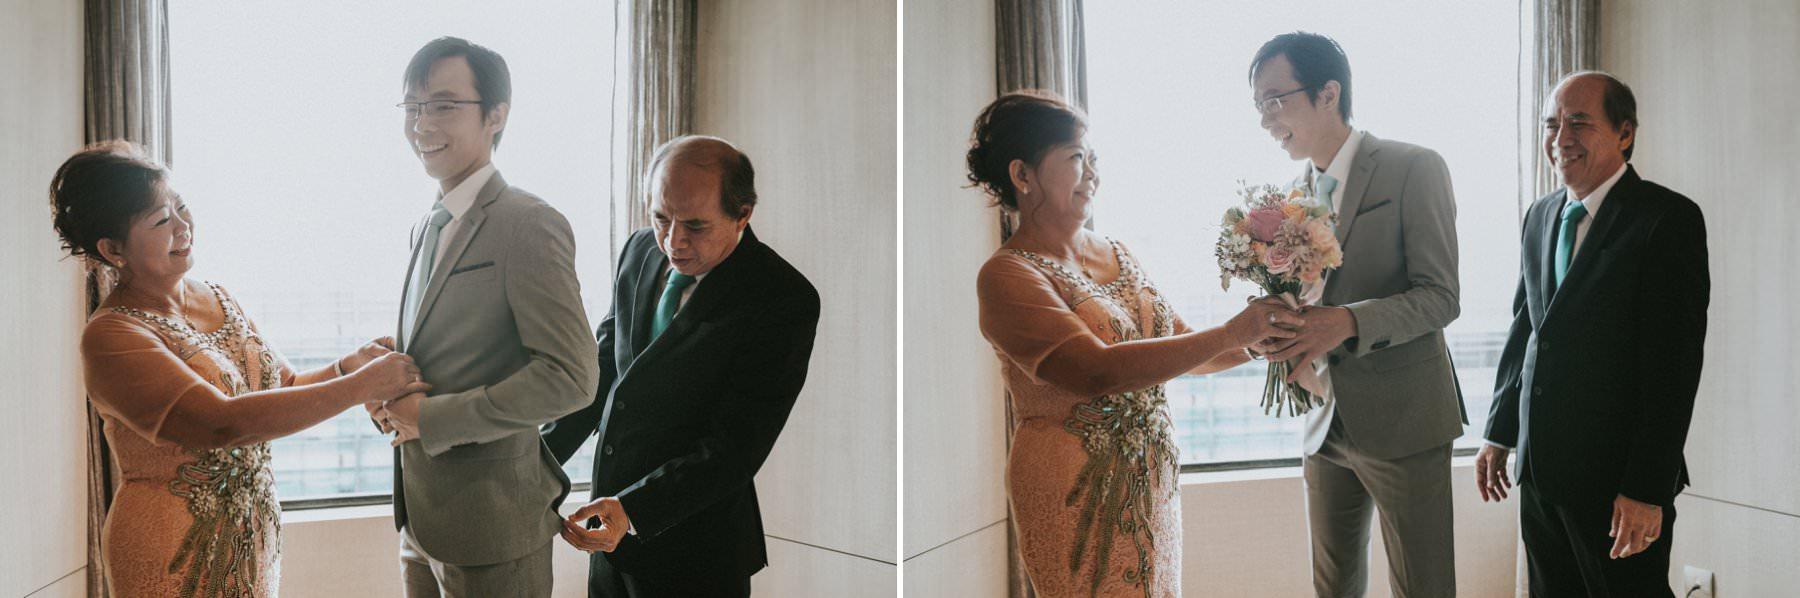 Singapore_Chijmes_Hall_Wedding_0013